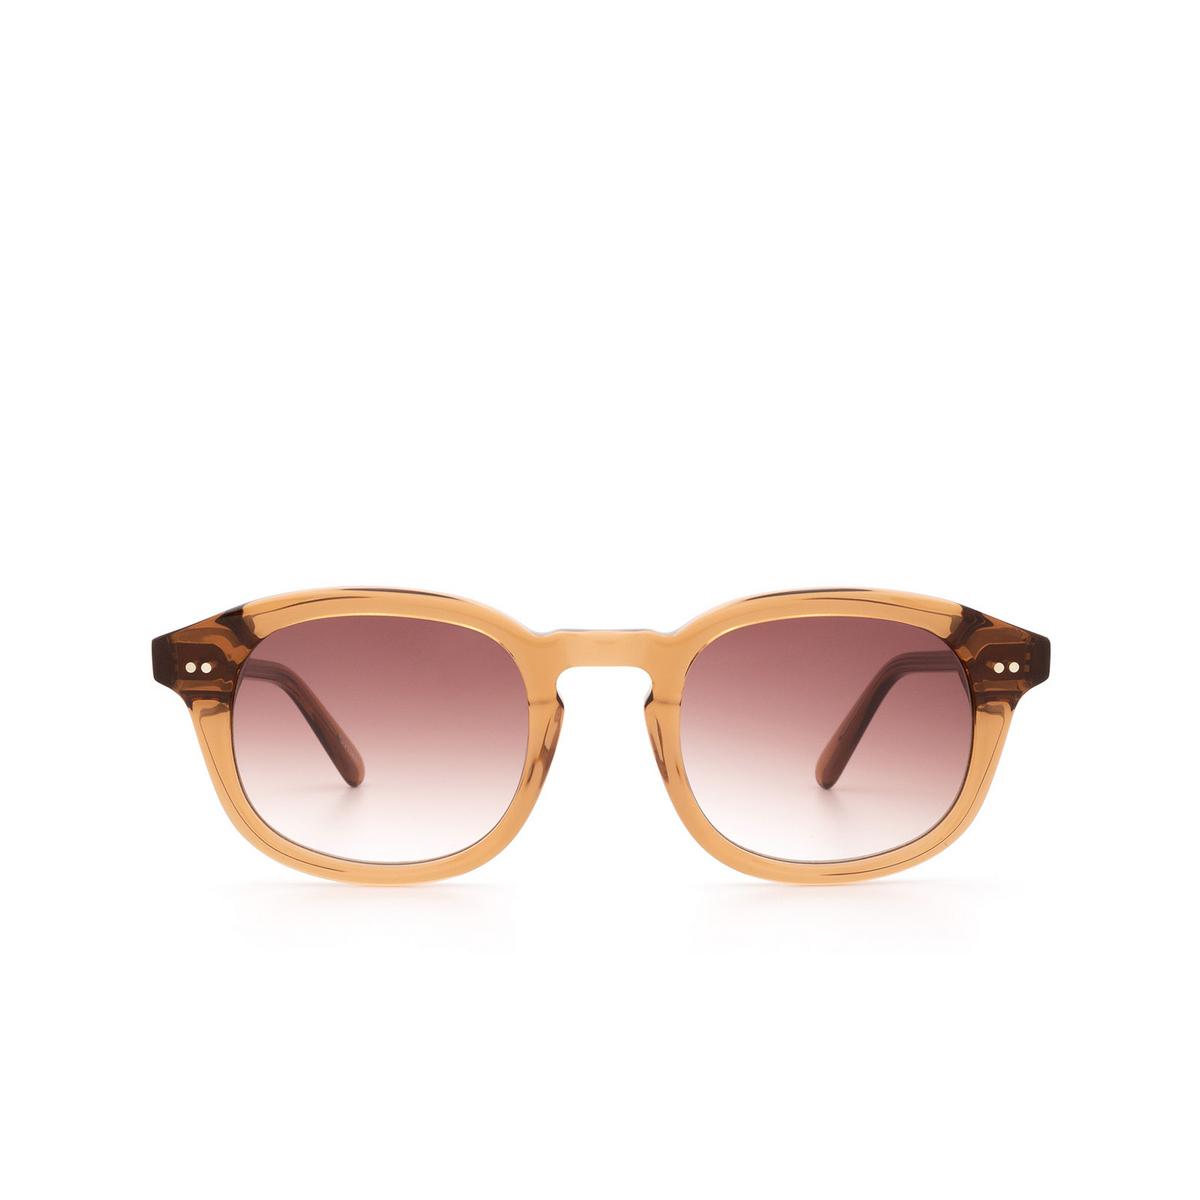 Chimi® Square Sunglasses: #102 color Brown Cinnamon Brown - front view.